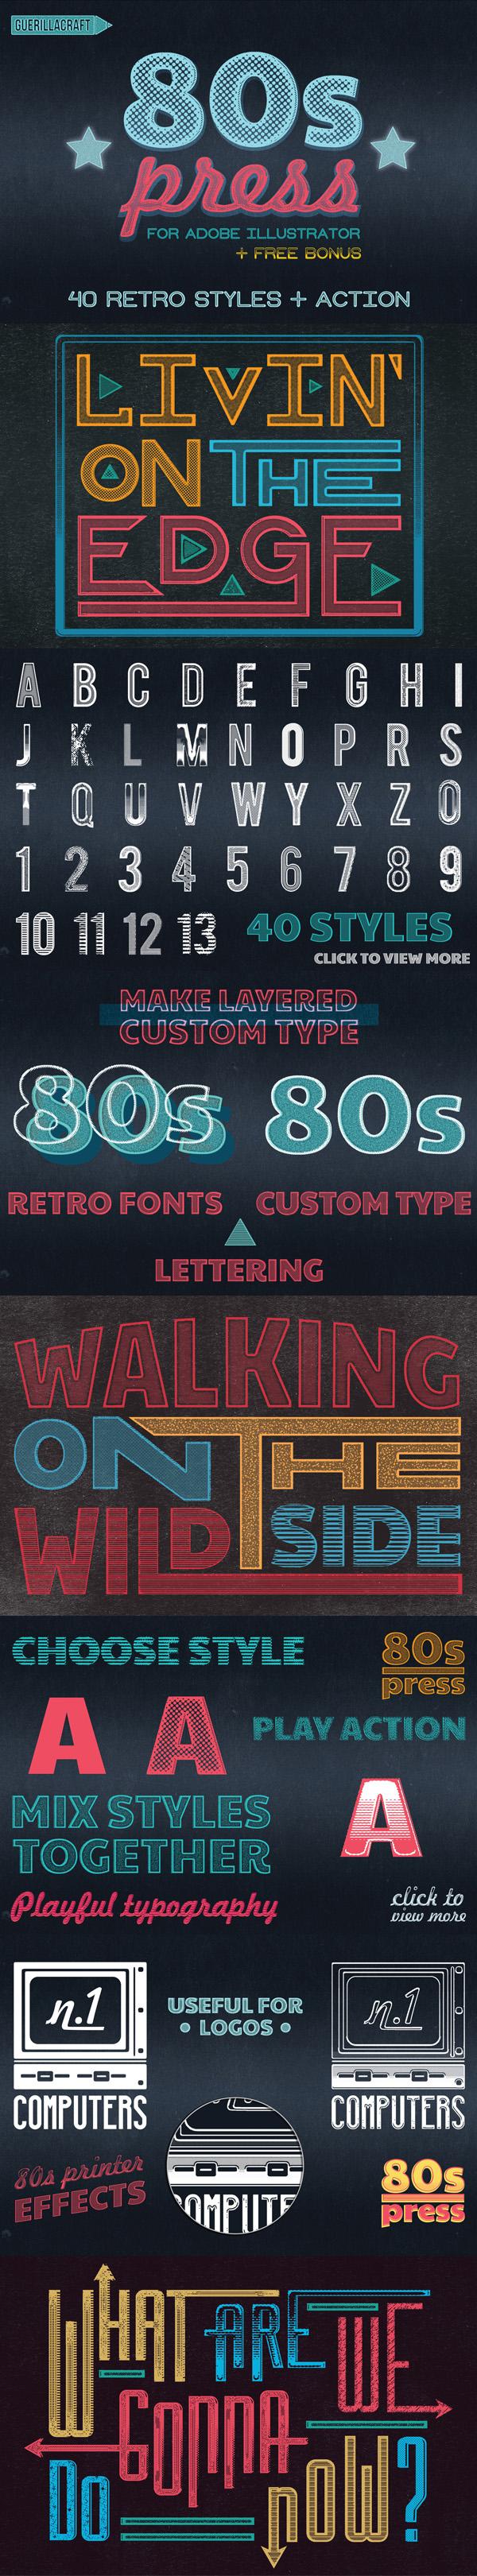 Freebies for 2019: Free 40 Retro Style for Adobe Illustrator